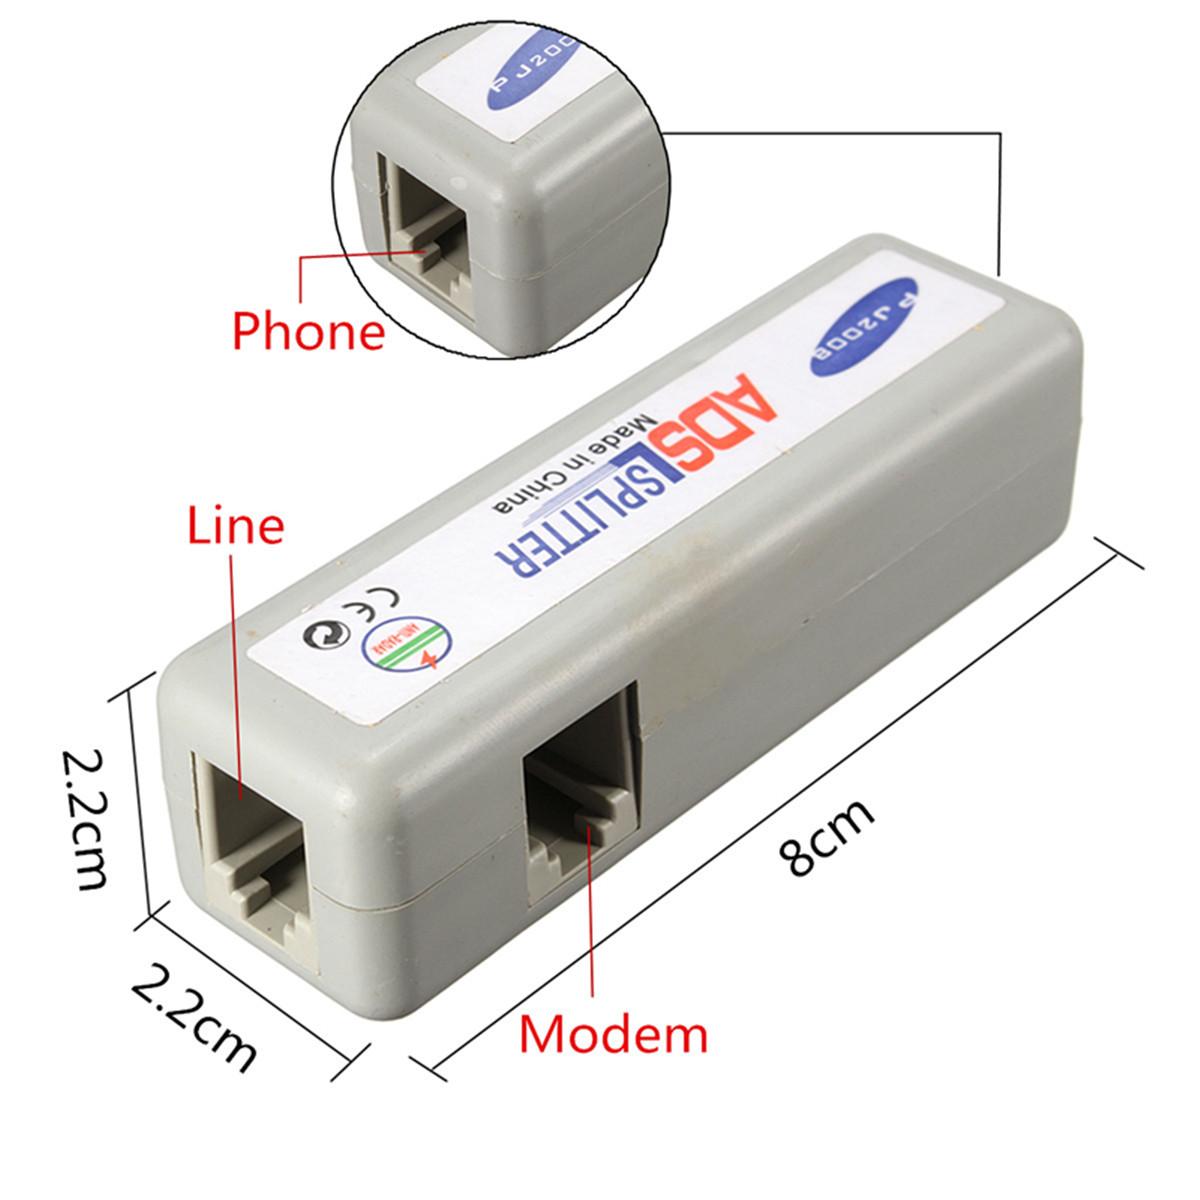 rj11 adsl fax modem broadband phone network cable line filter splitter ebay